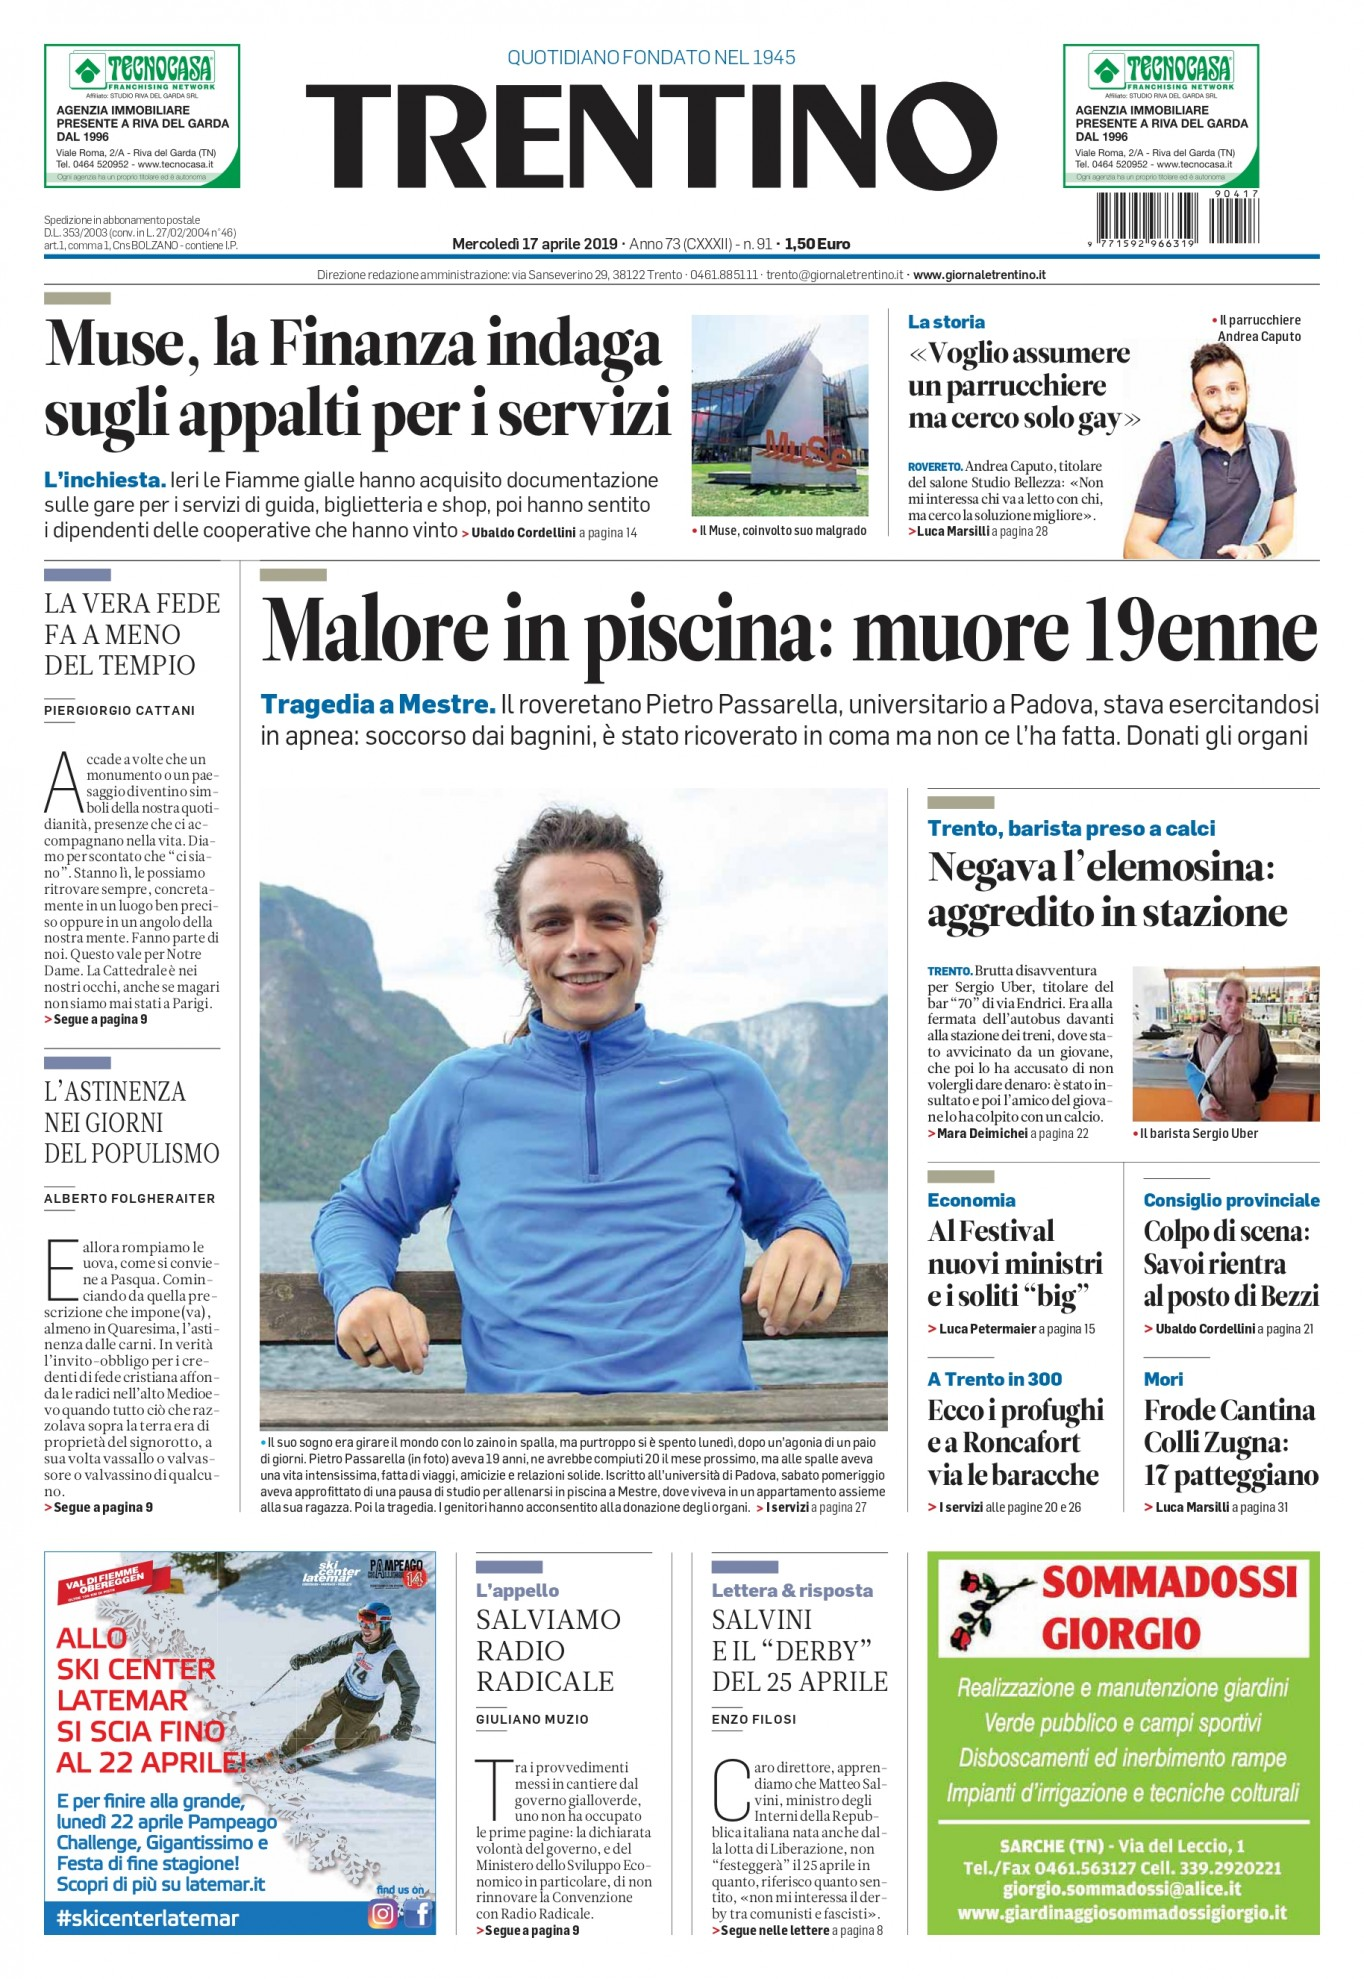 Trentino-17.04.2019-01_page-0001